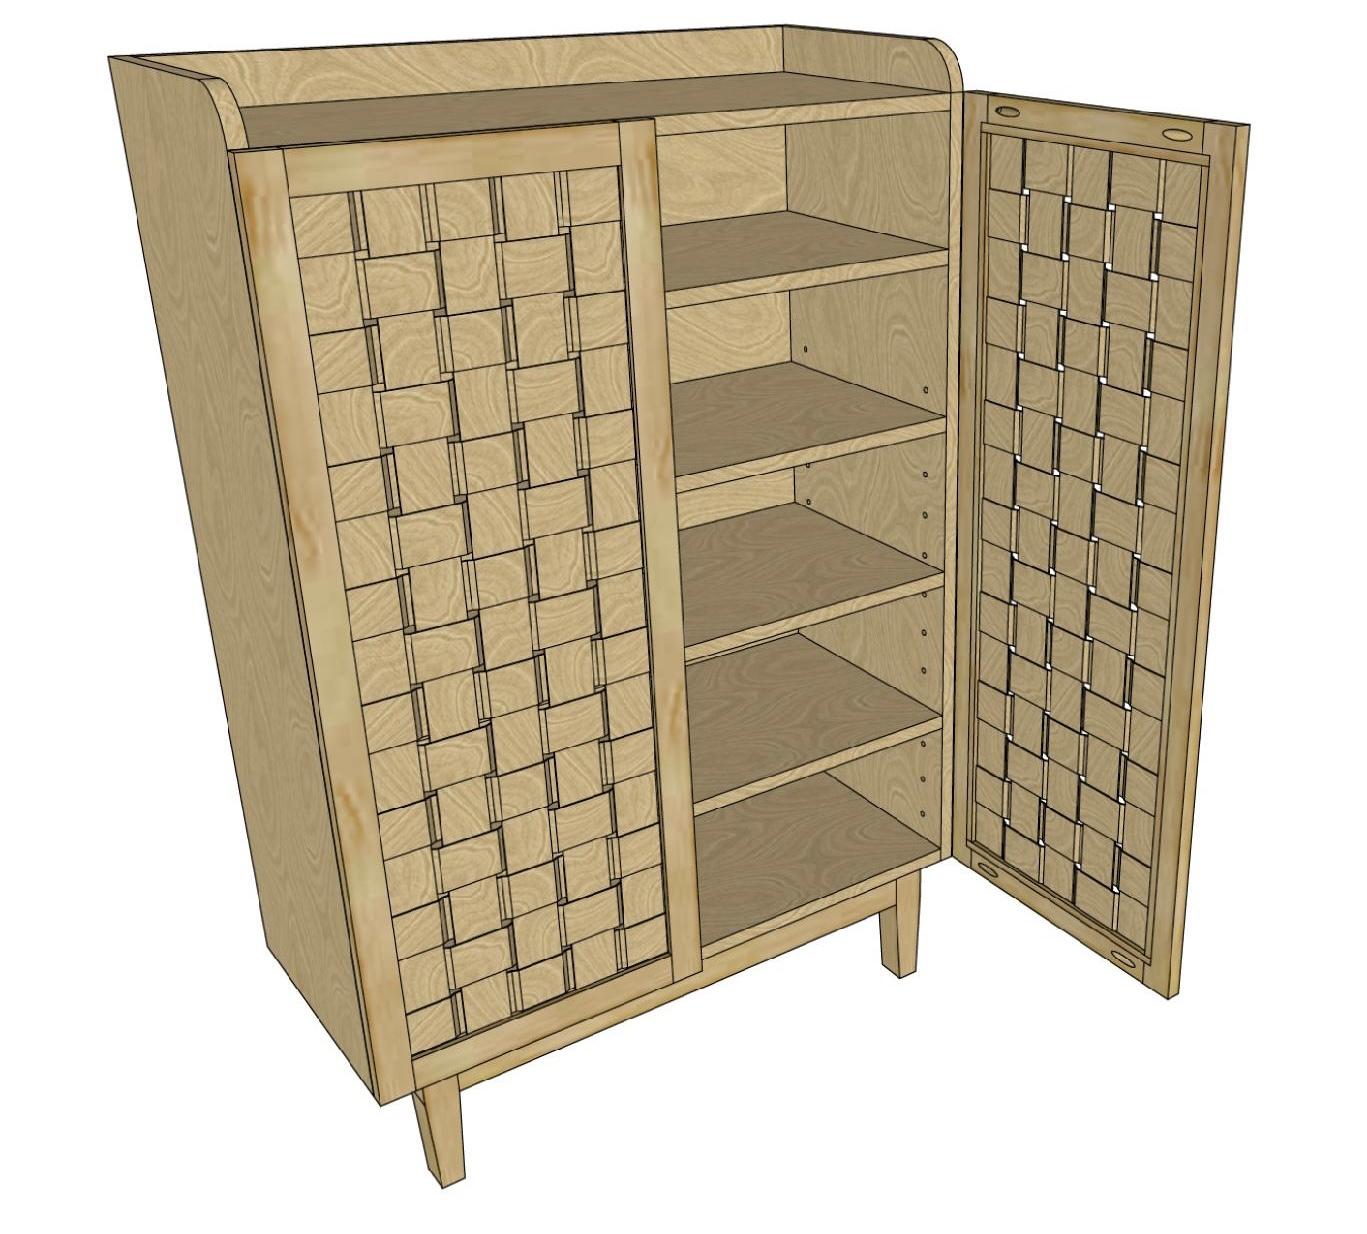 3d plan view of DIY shoe cabinet